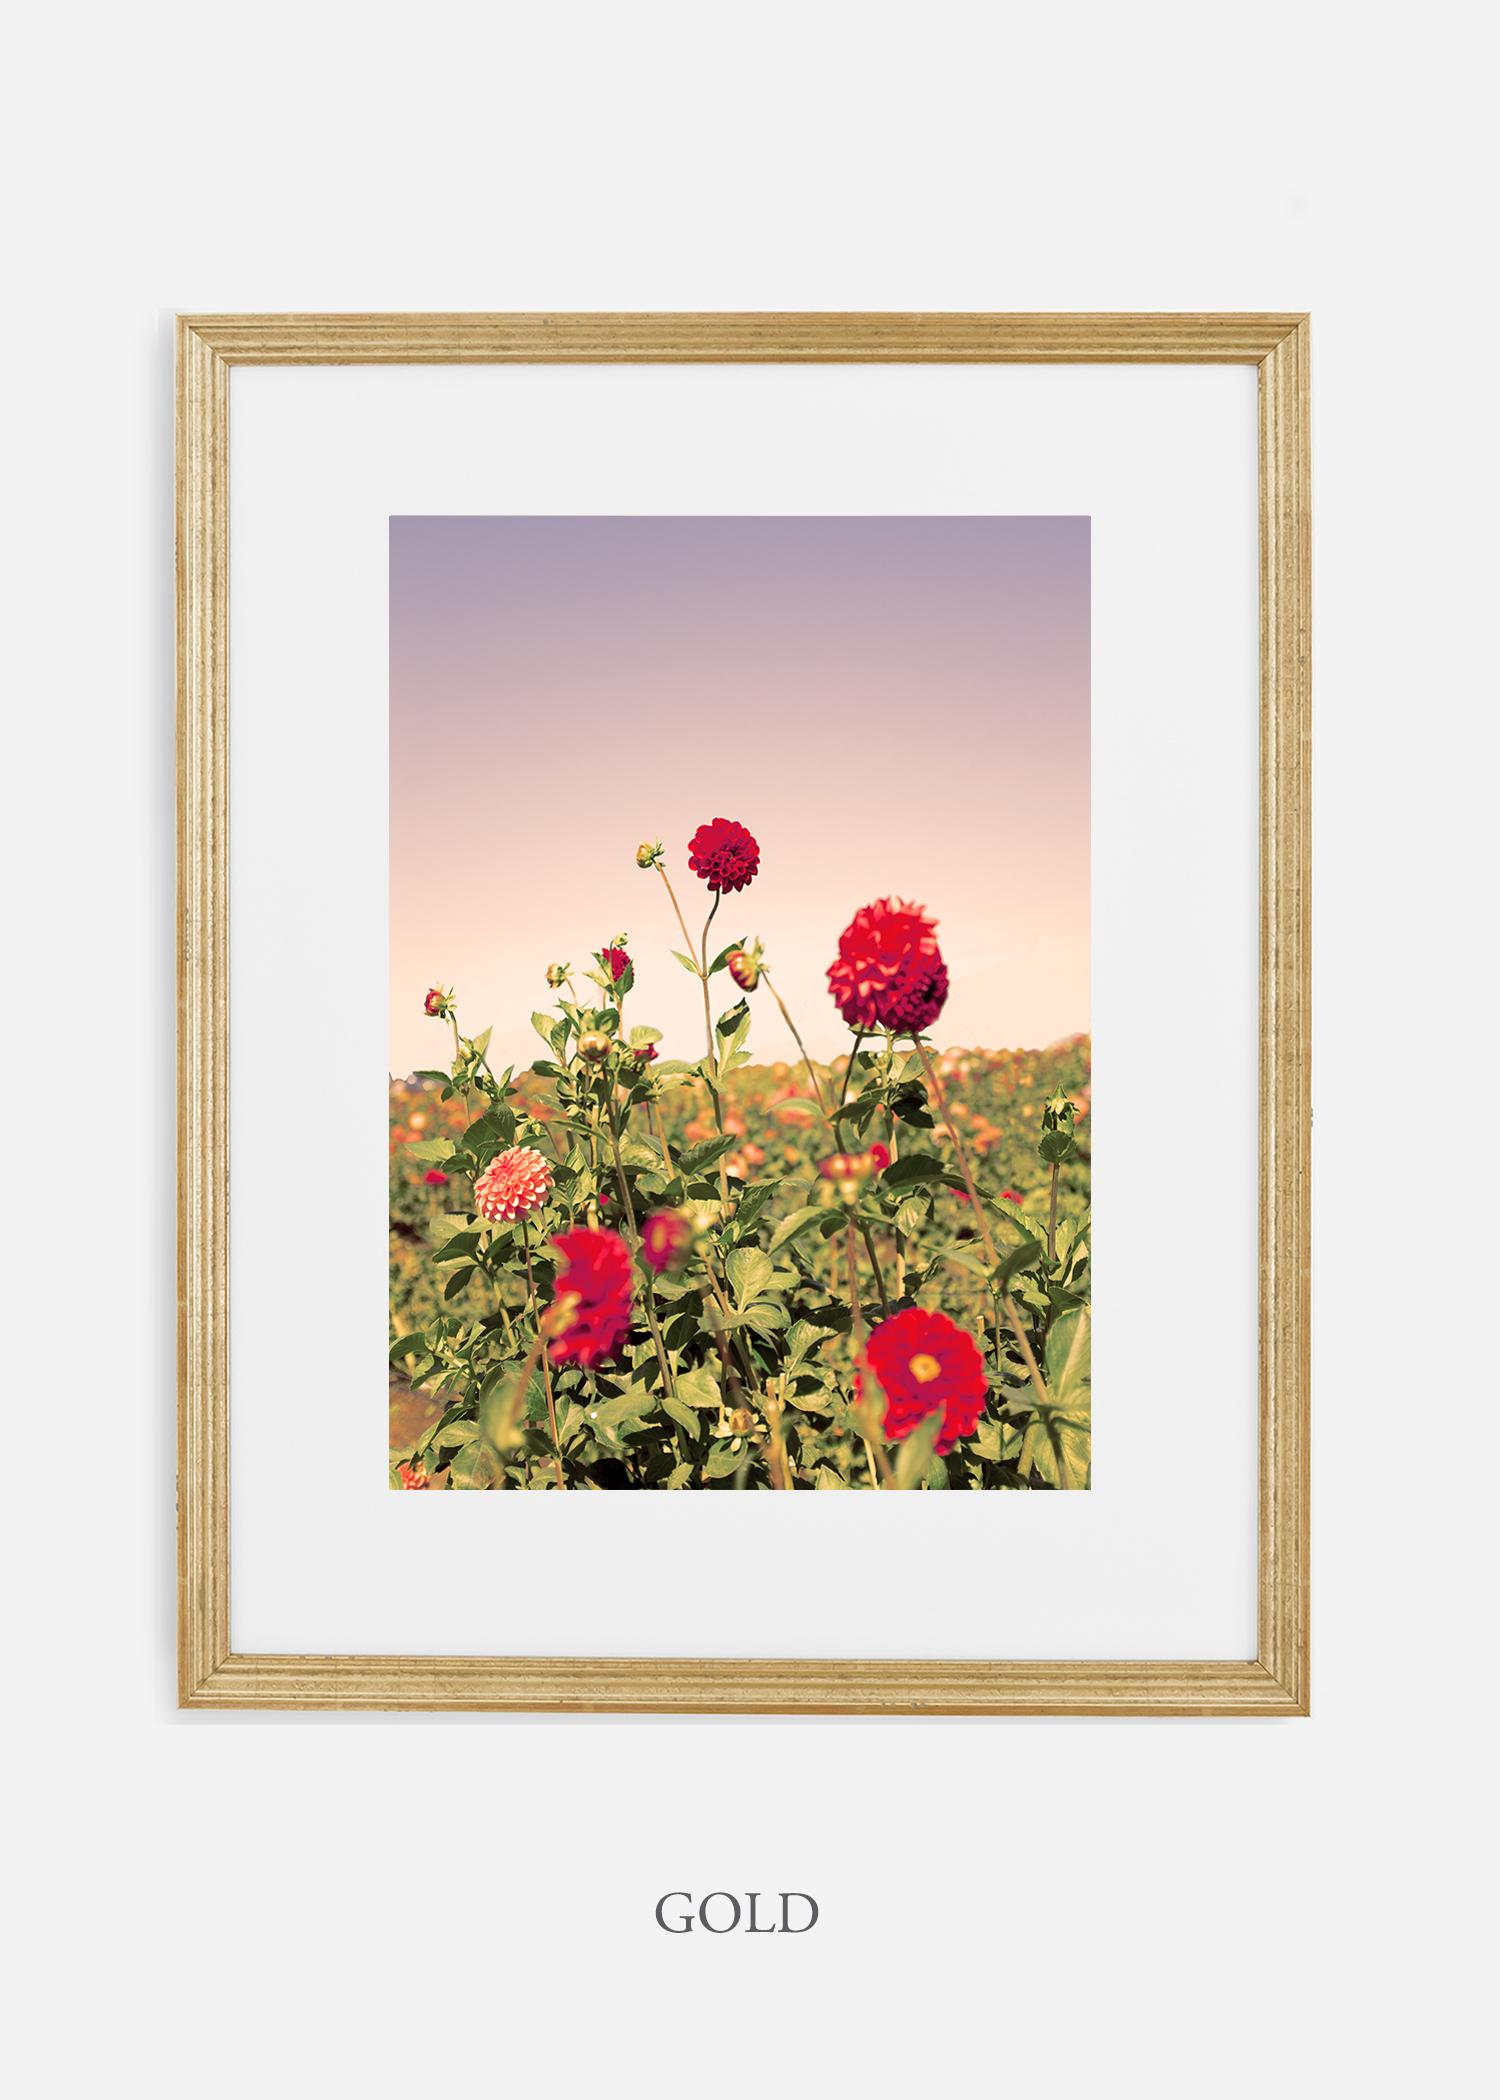 DahliaNo.8-gold-frame-mat-interior-design-botanical-print-art-wilder-california-wilder-paper.jpg